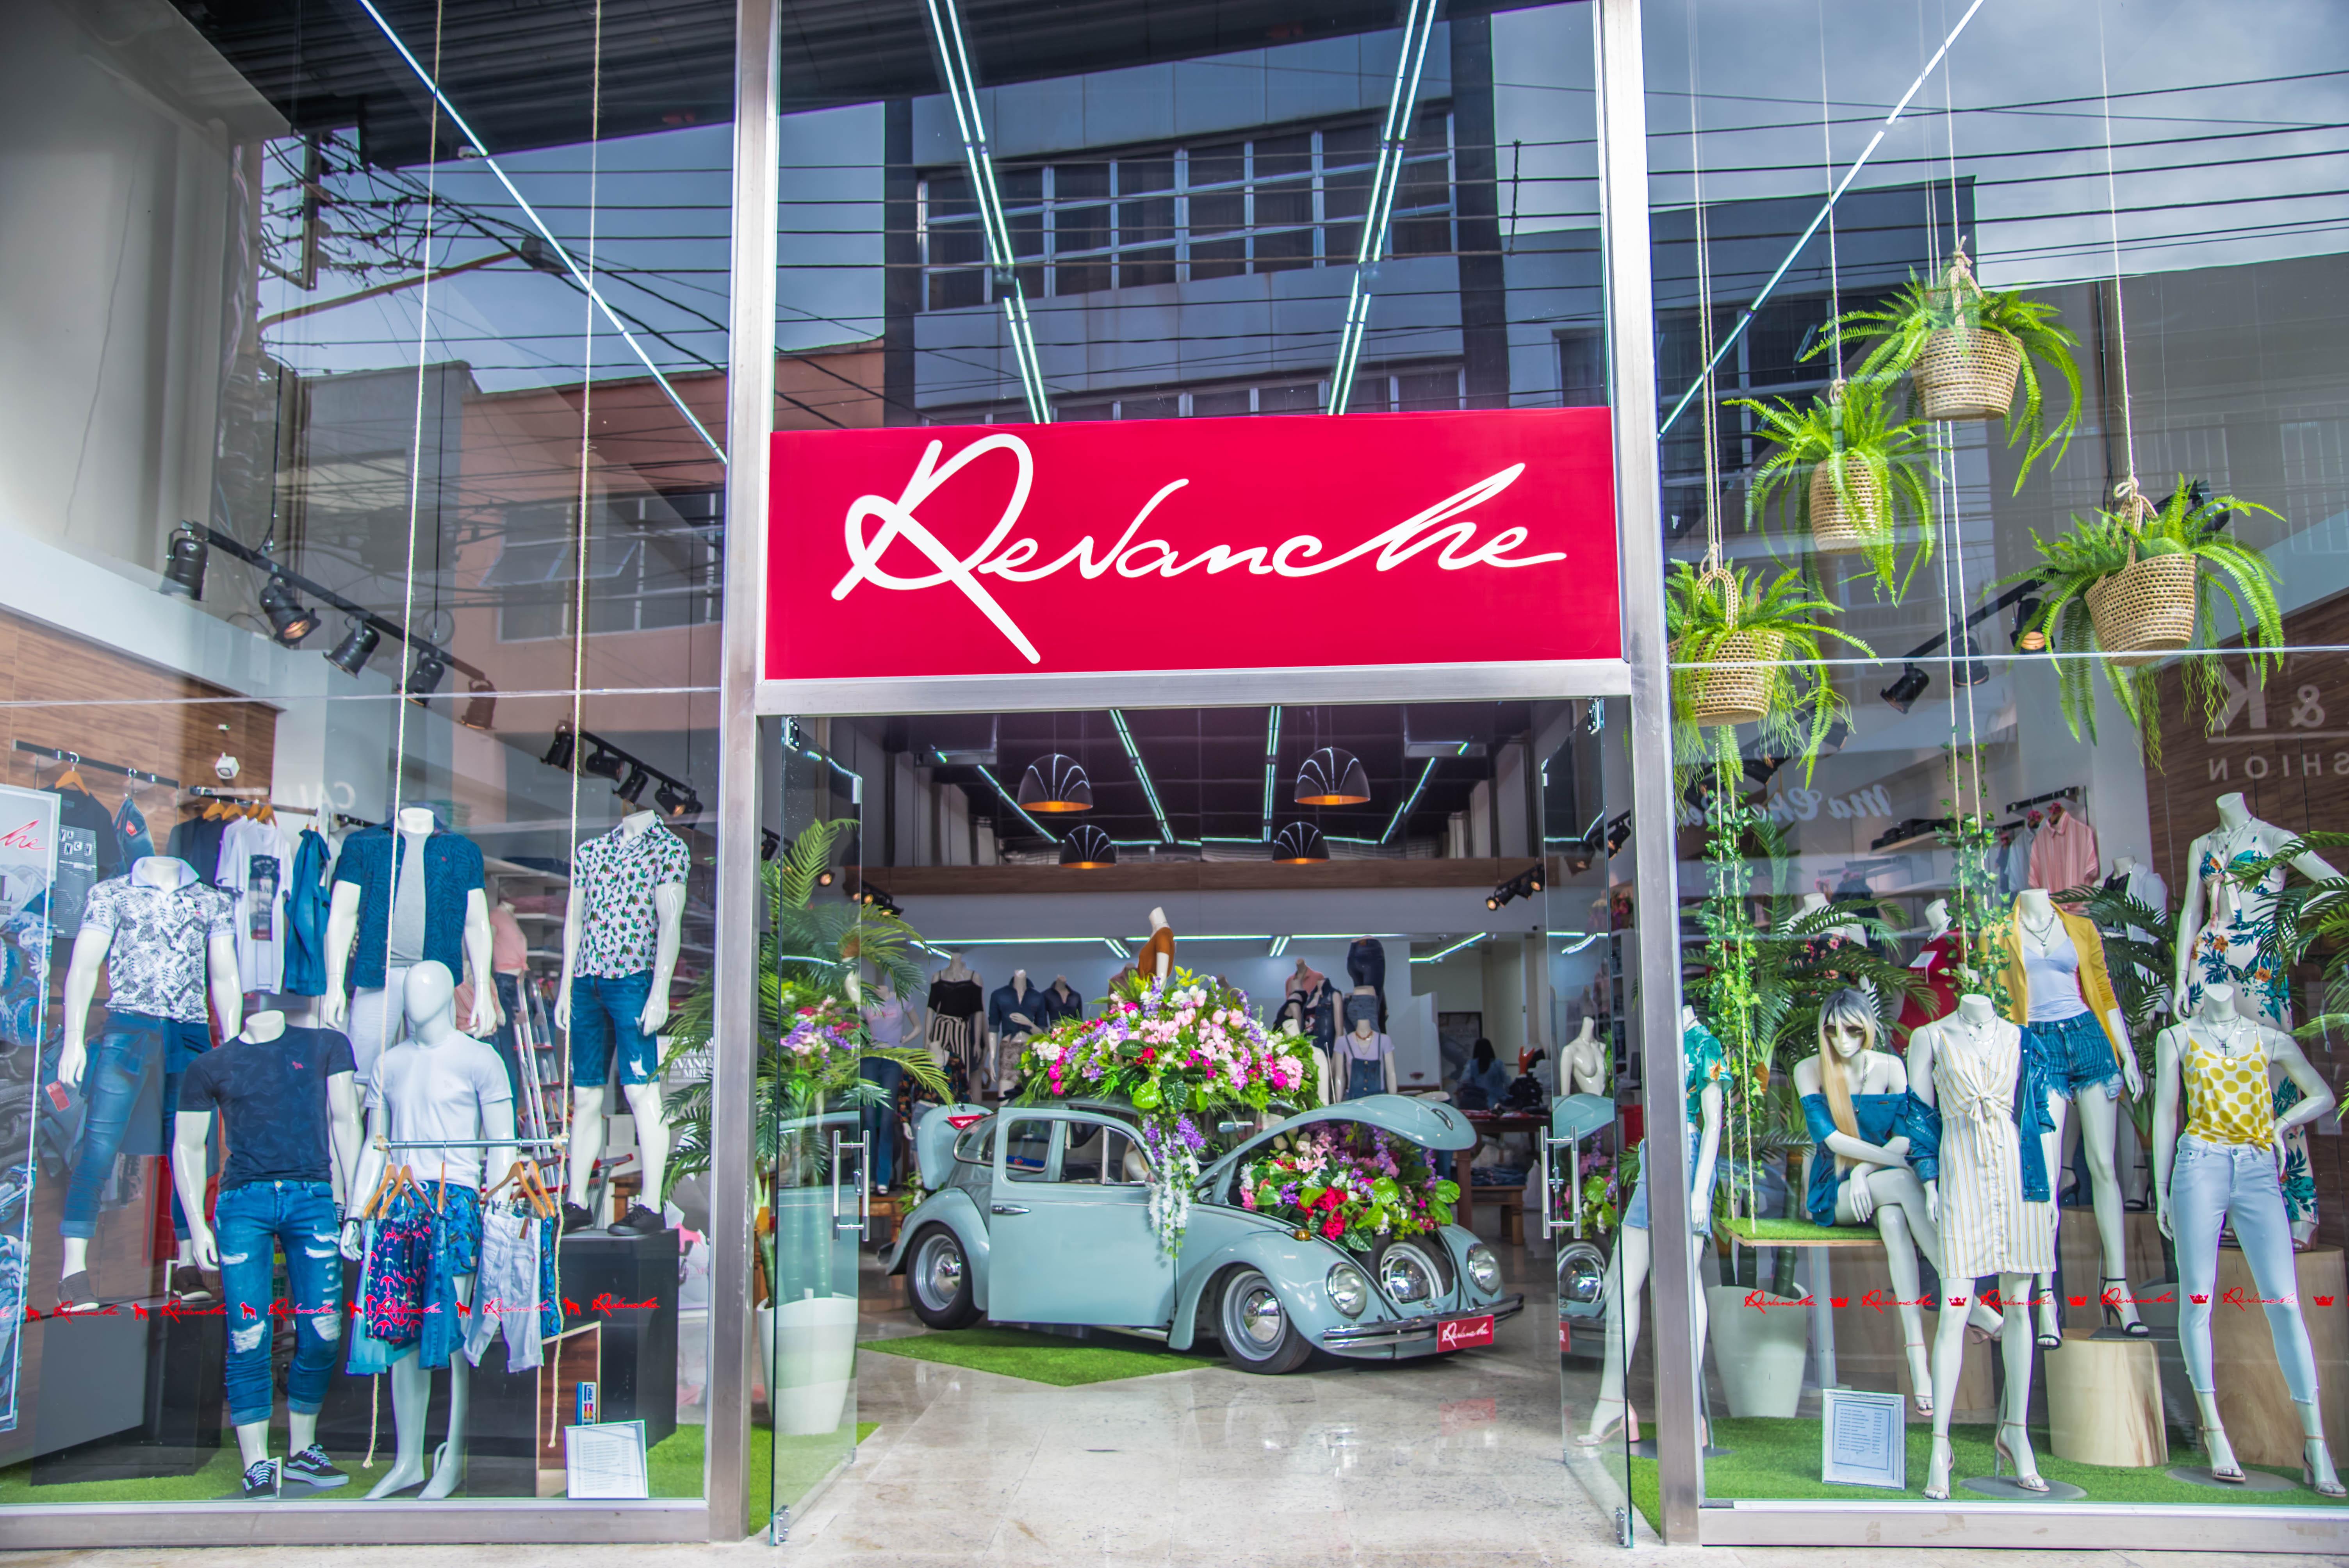 Revanche Jeans reinaugura loja no Brás, em novo endereço